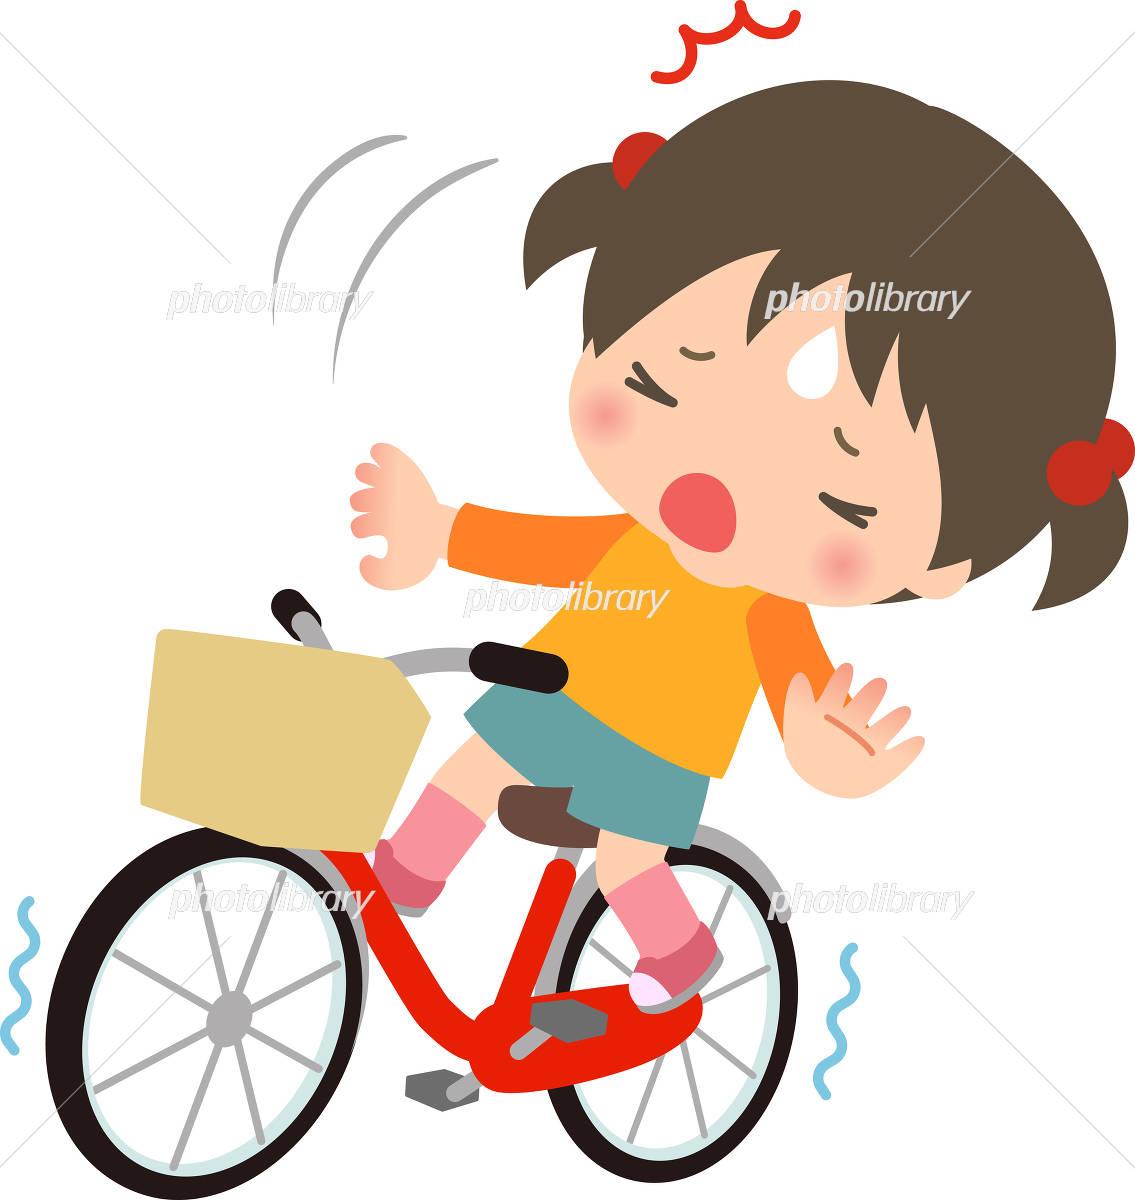 「自転車 転ぶ 子供 無料」の画像検索結果